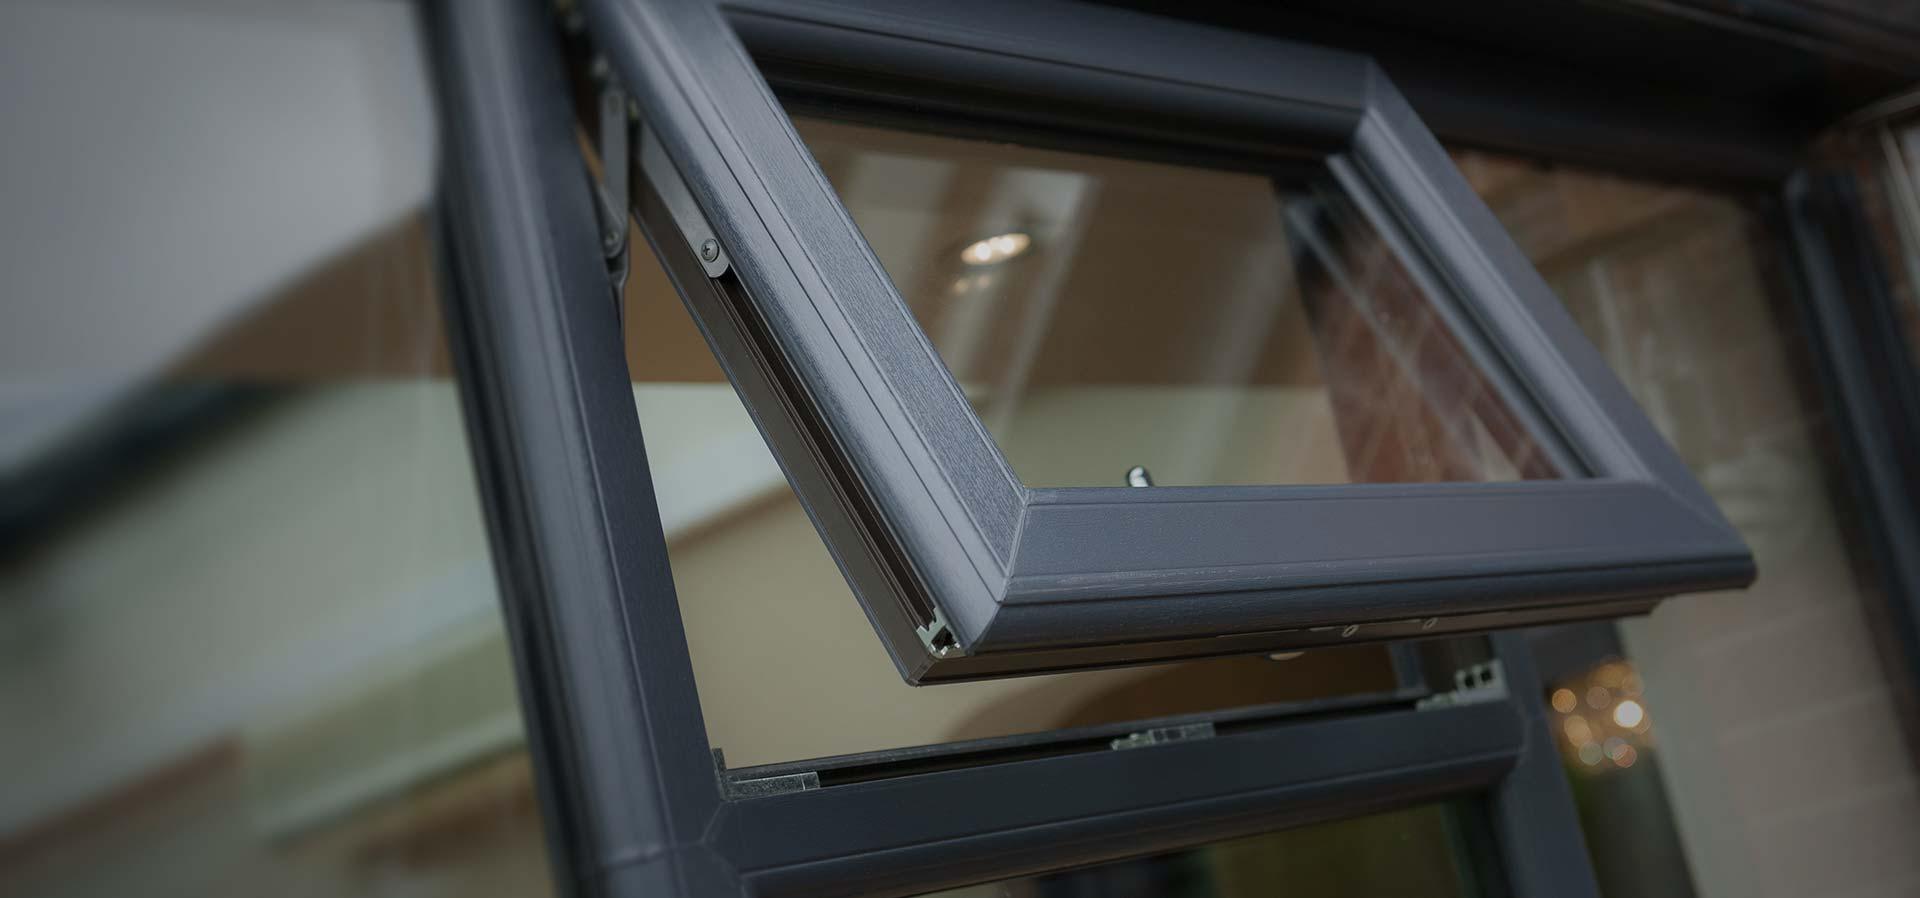 uPVC window manufactured using Decuenincks decorative 2800 profile